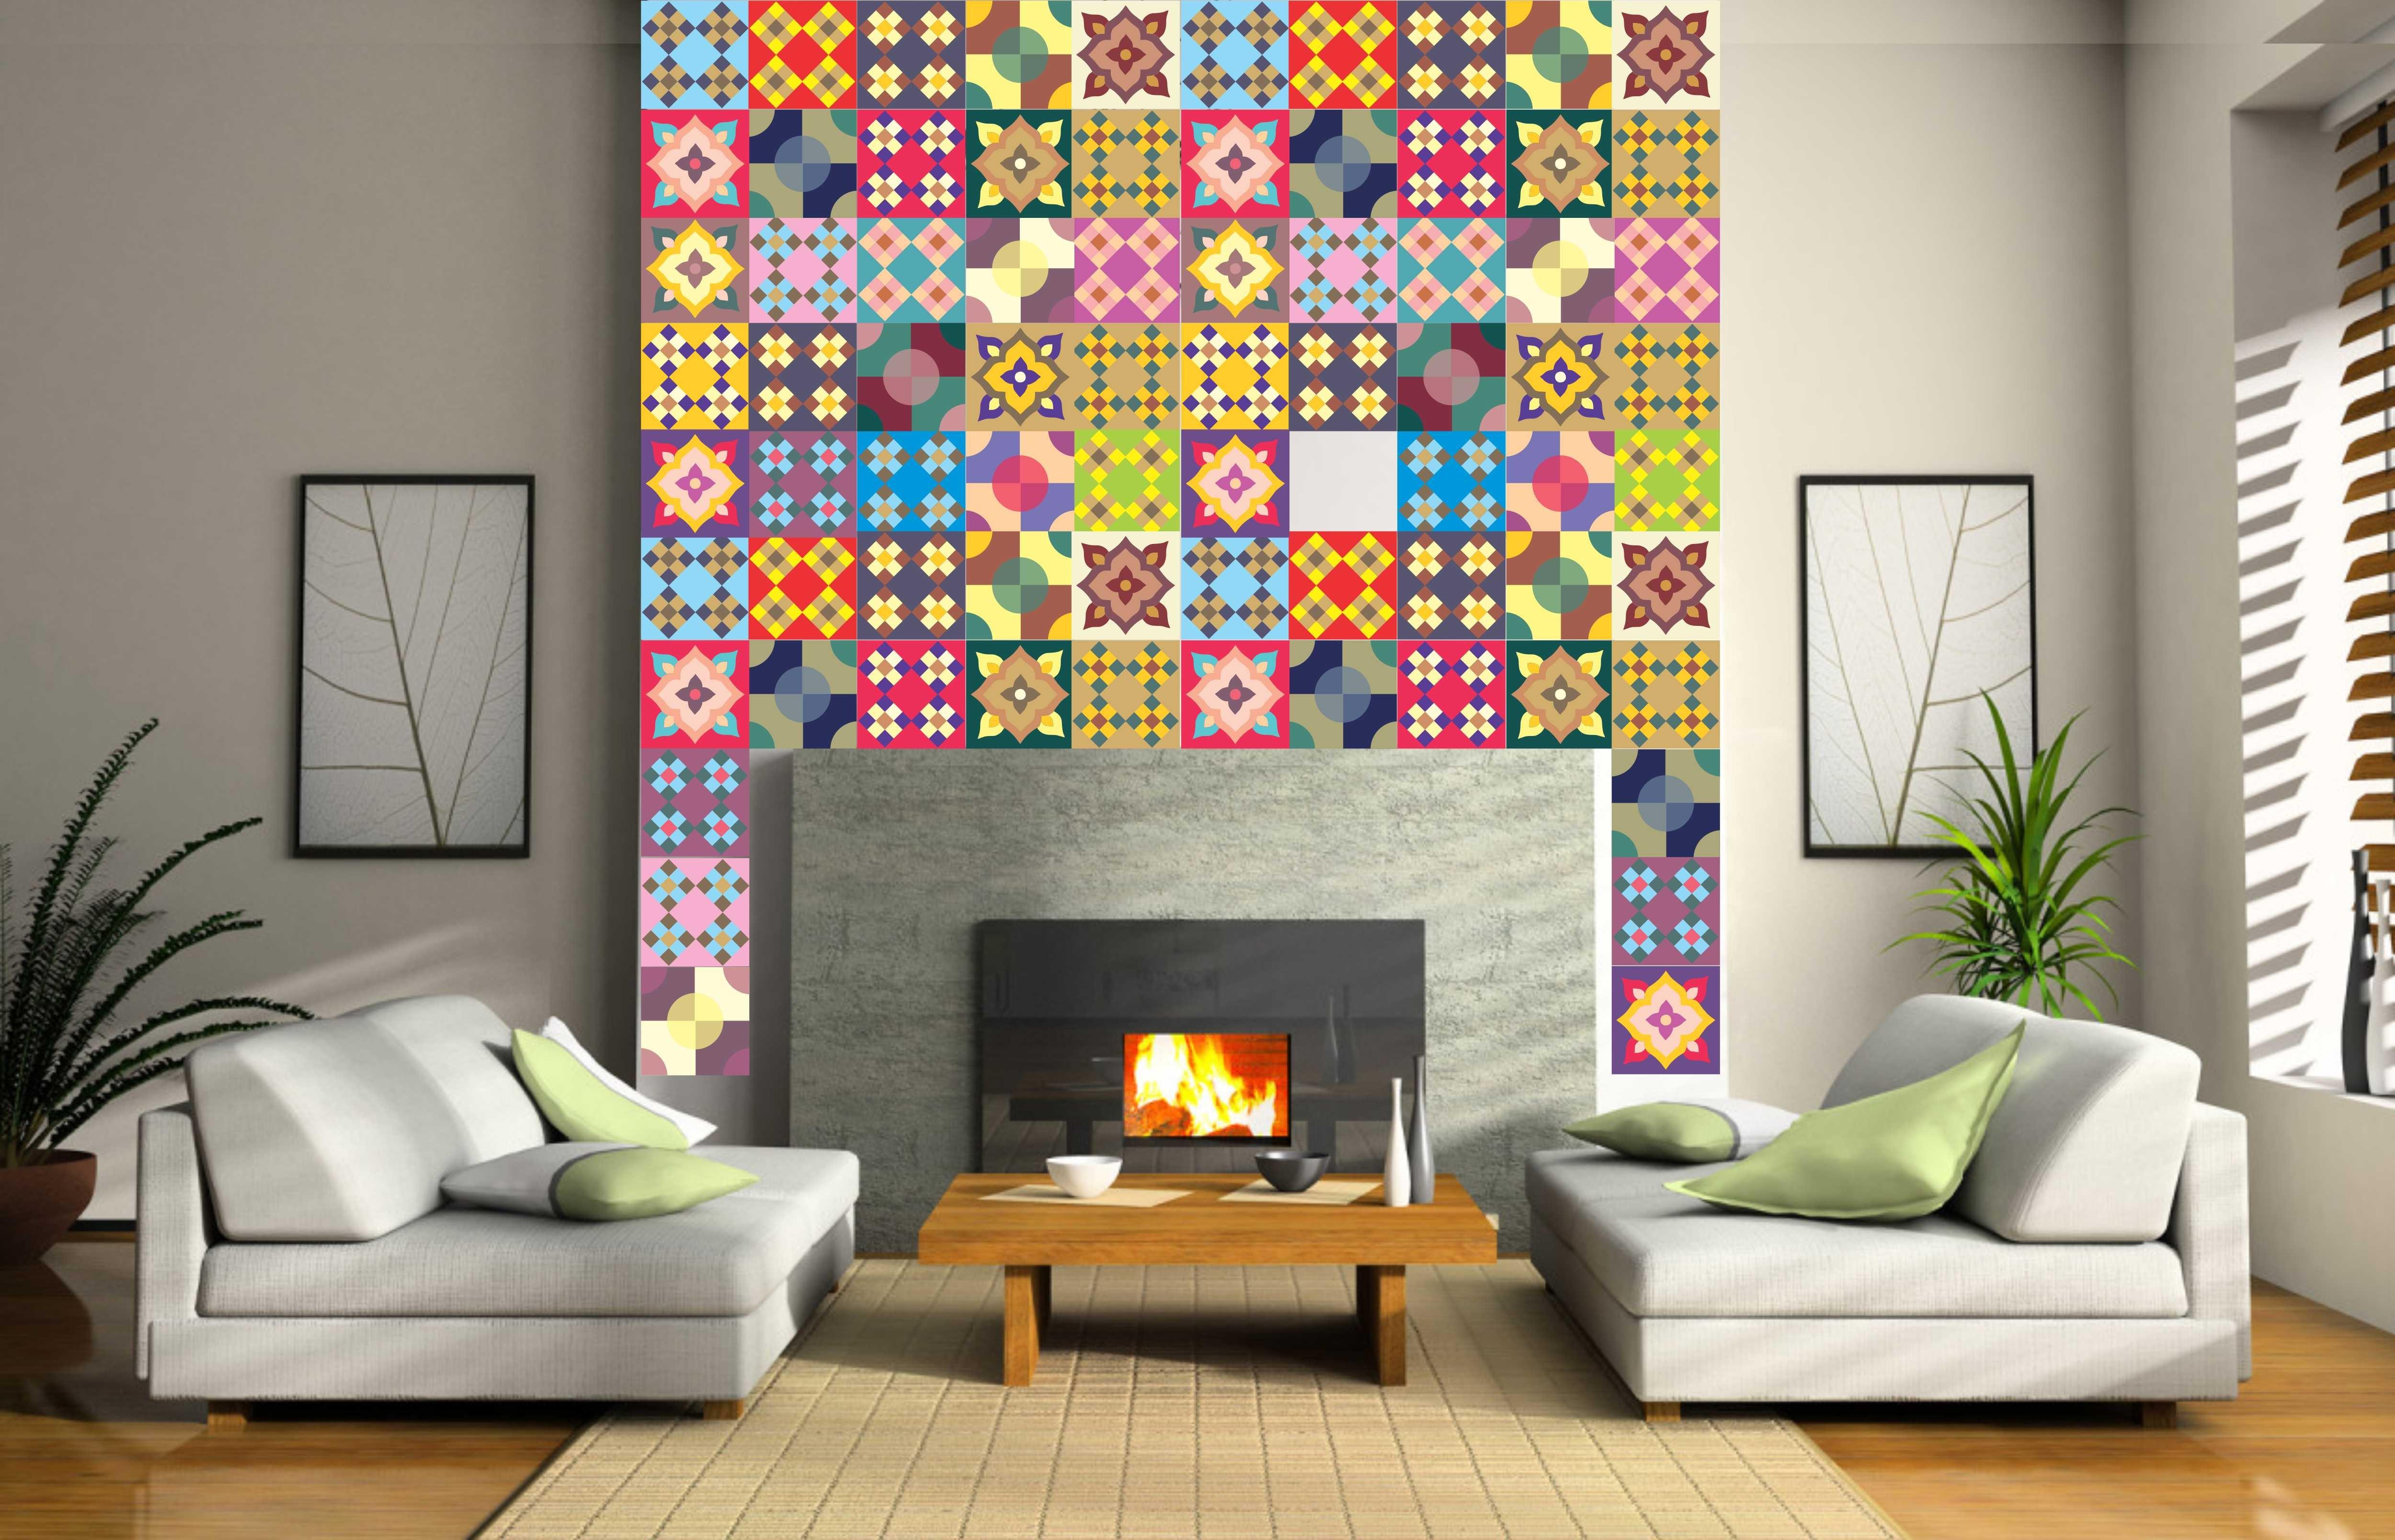 Adesivos para azulejos 3